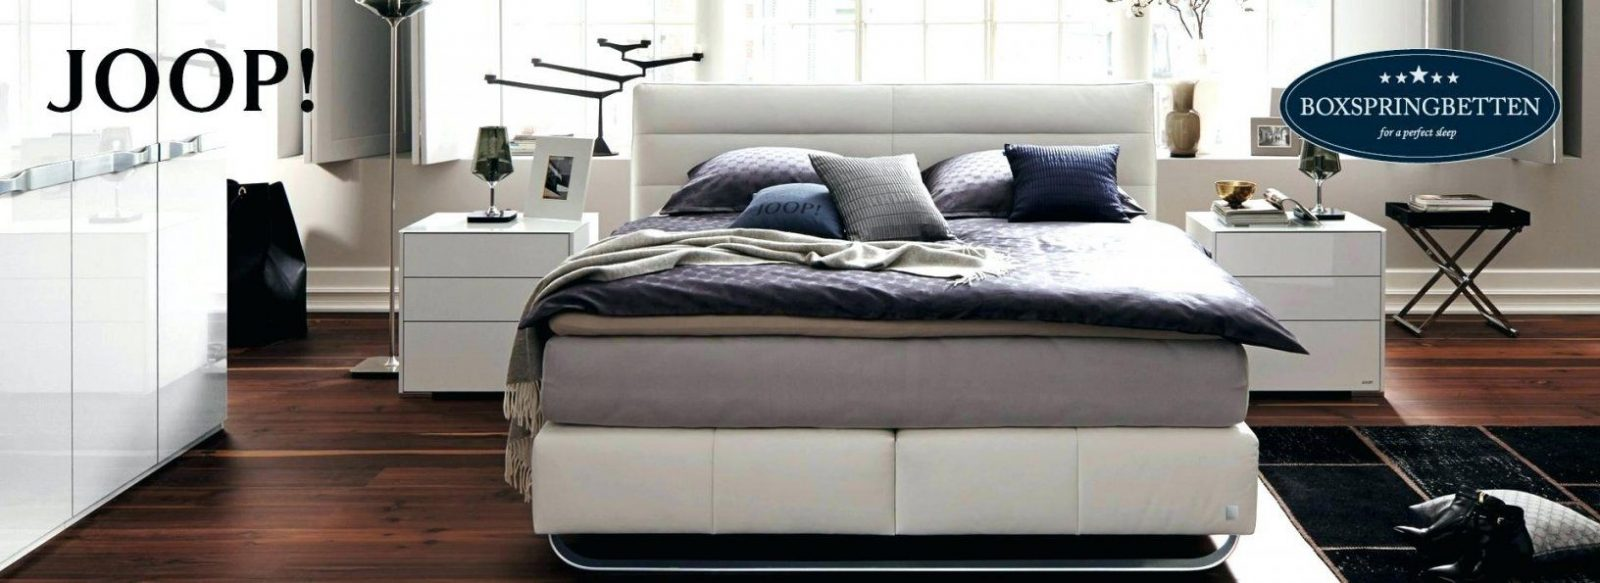 foto lichterkette basteln pers nliche diy deko selber. Black Bedroom Furniture Sets. Home Design Ideas